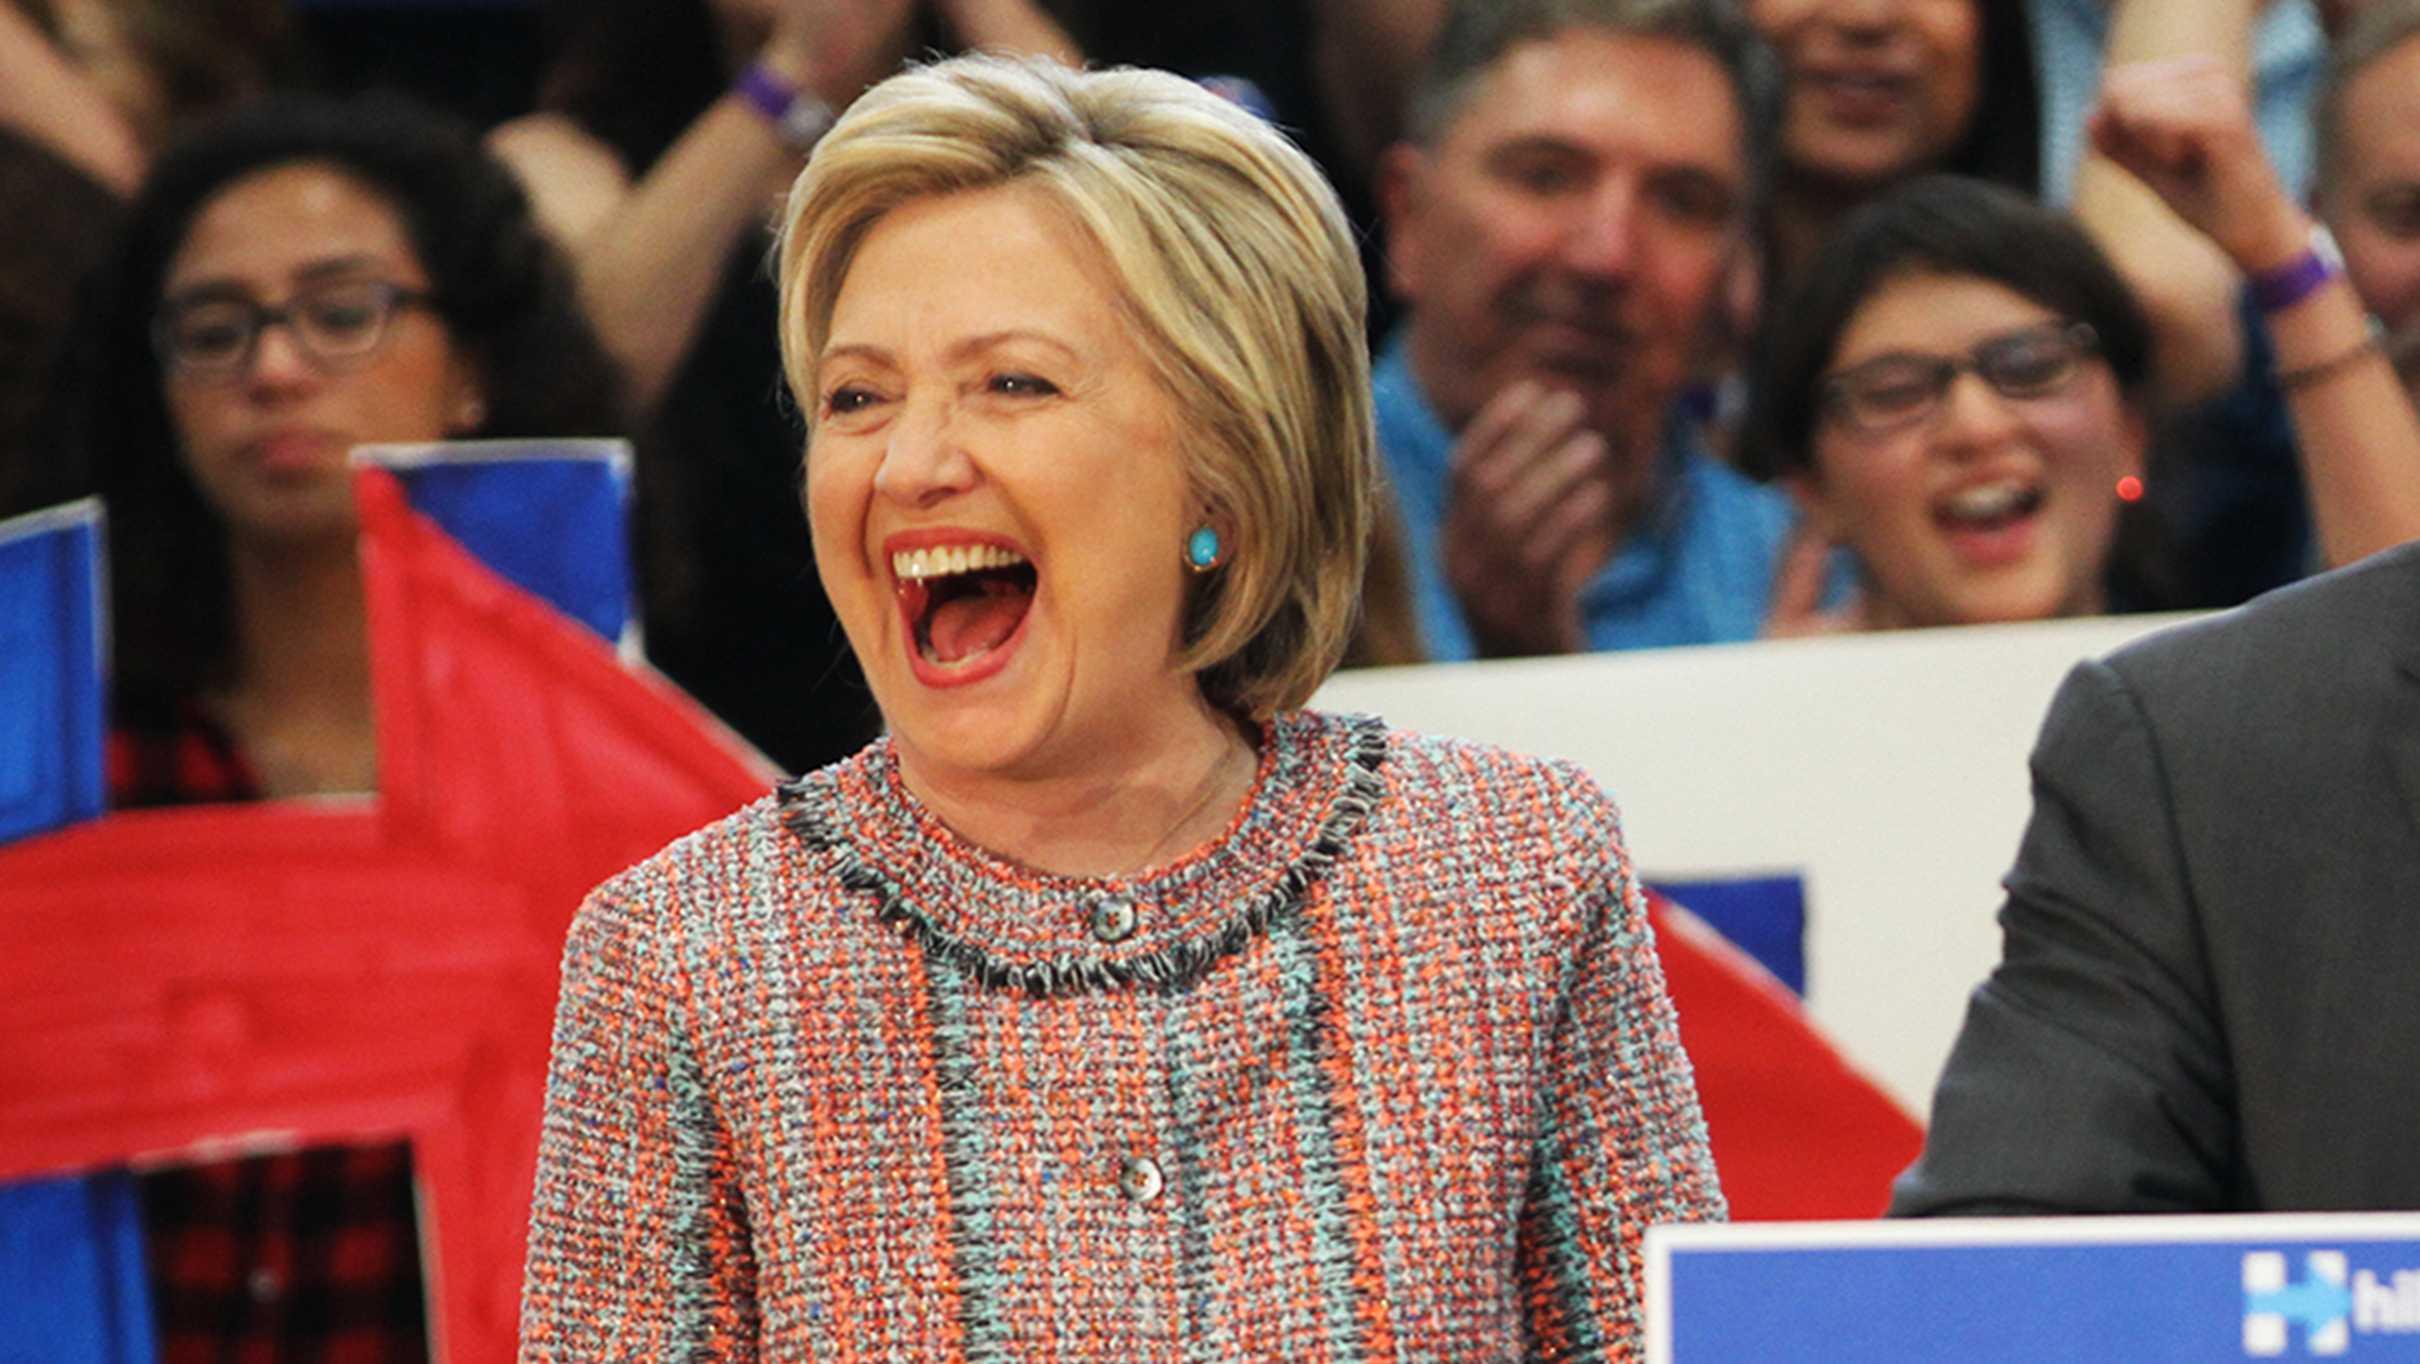 Hillary Clinton campaigns in Salinas